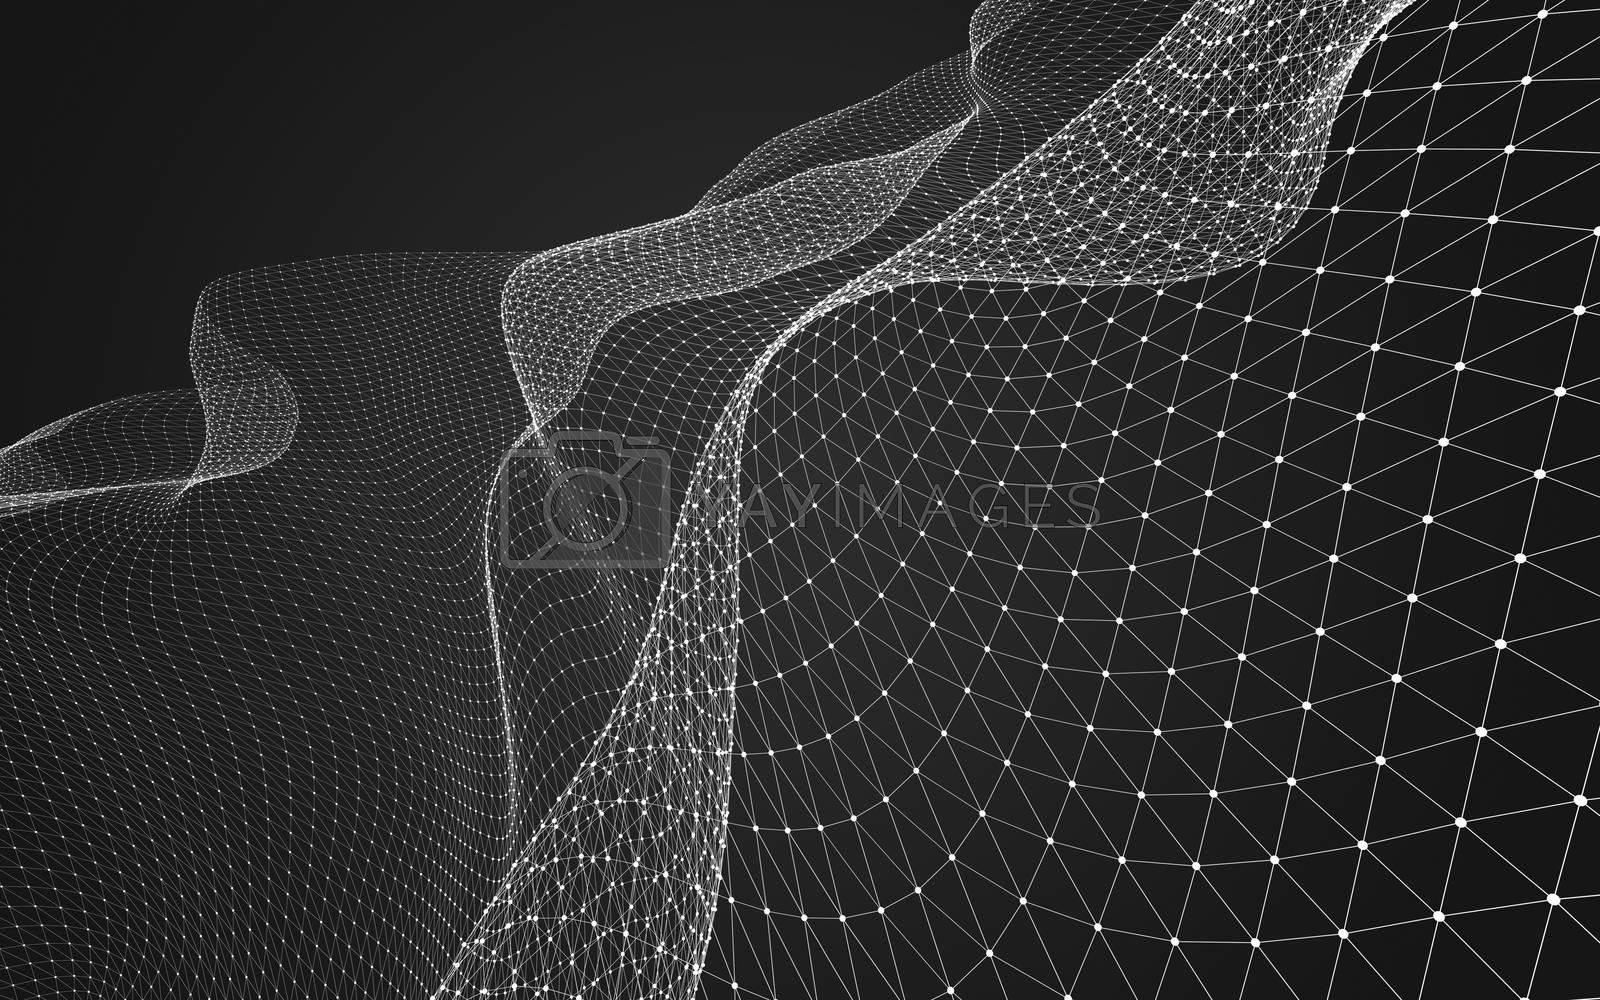 Abstract polygonal space low poly dark background, 3d rendering by teerawit